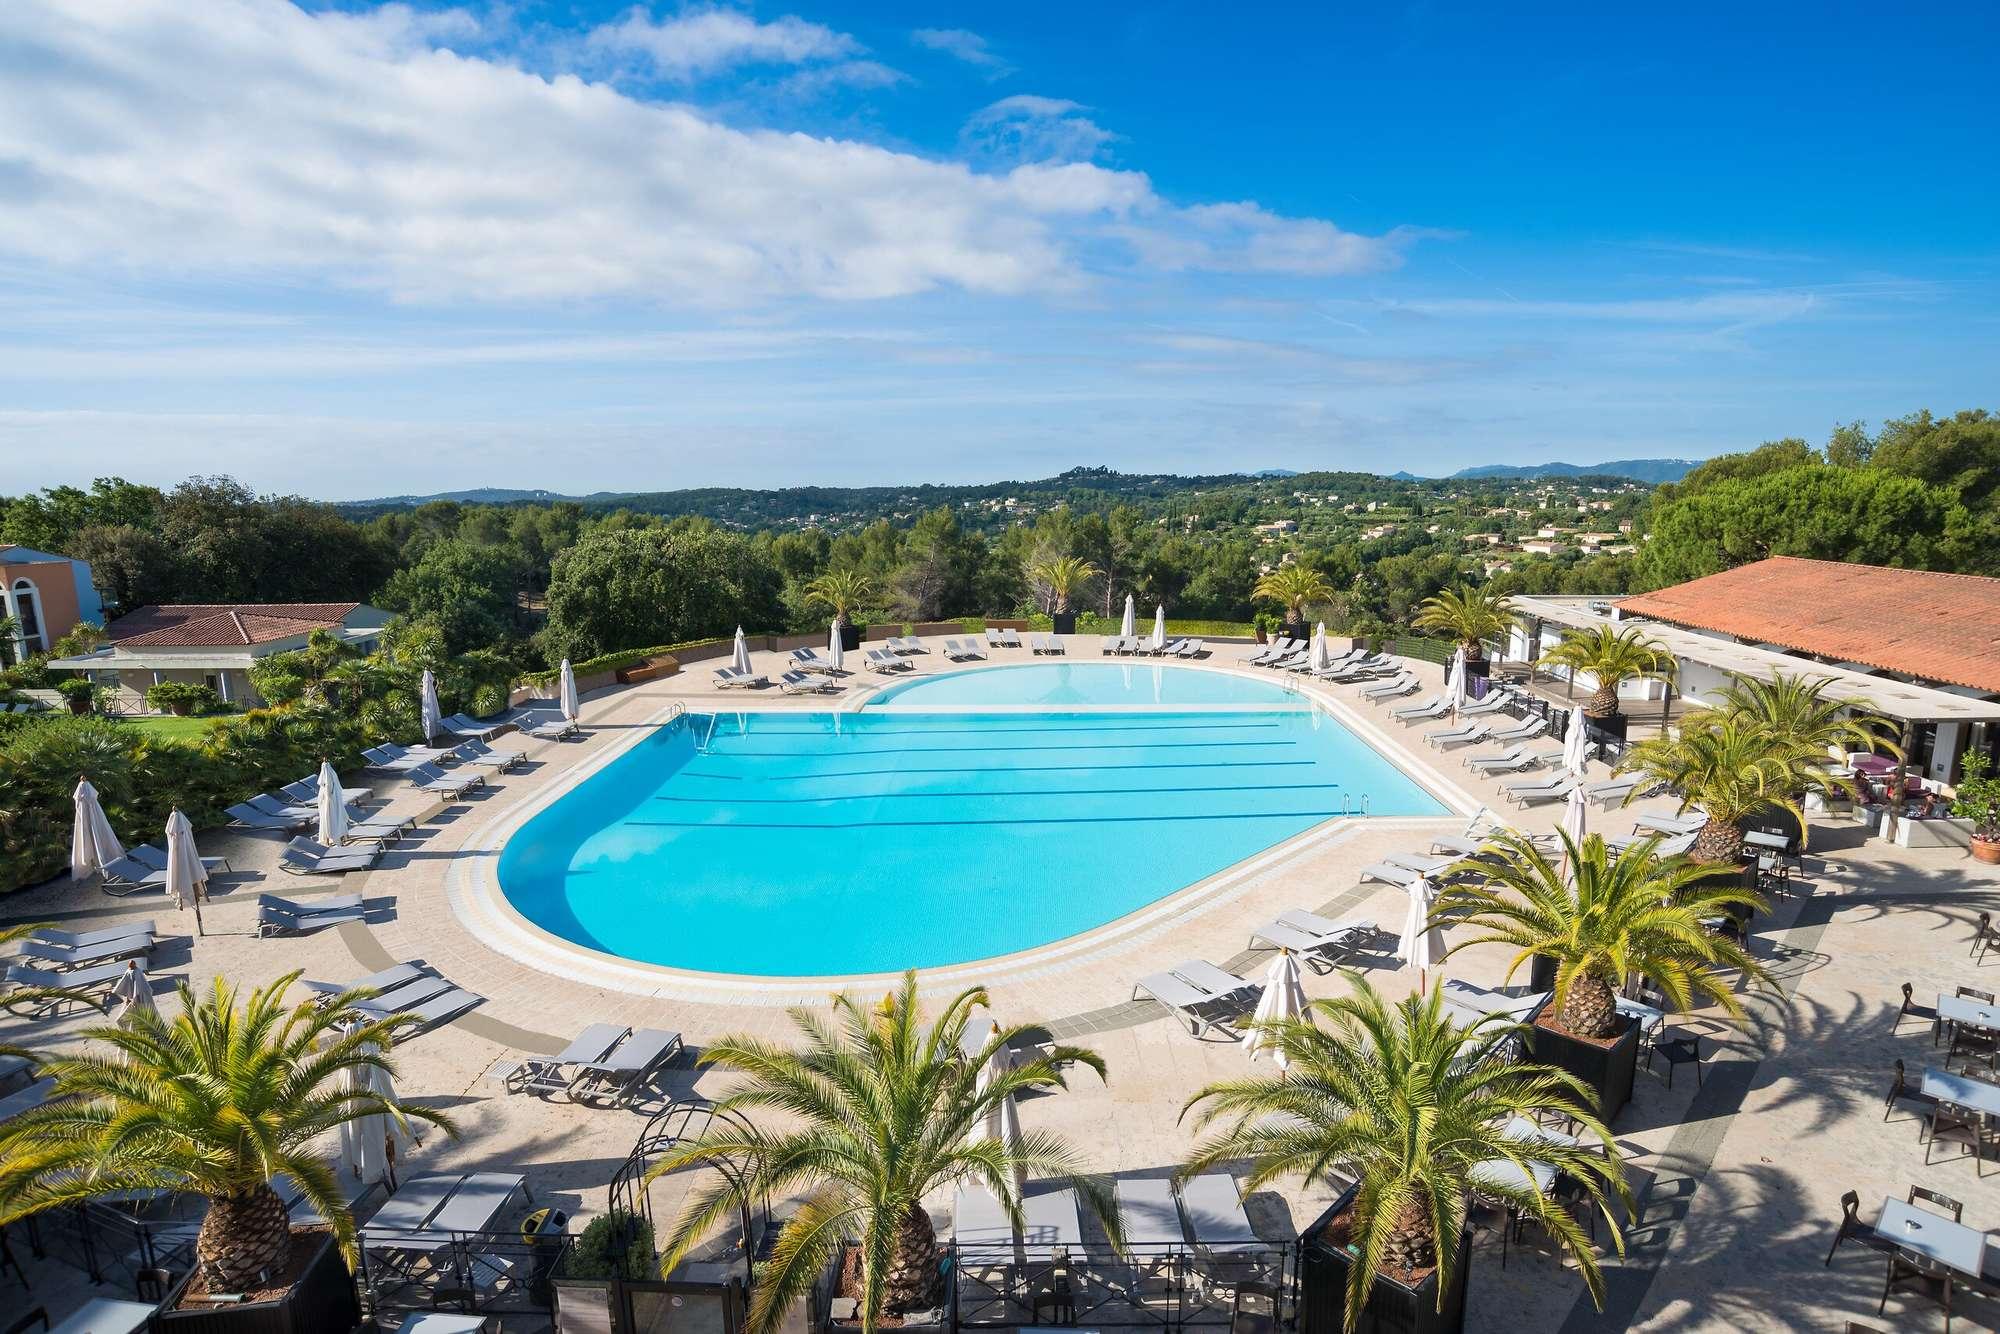 https___ns.clubmed.com_dream_RESORTS_3T___4T_Europe___Cotes_Mediterraneennes_Opio_en_Provence_68539-pbop7nodvl-swhr